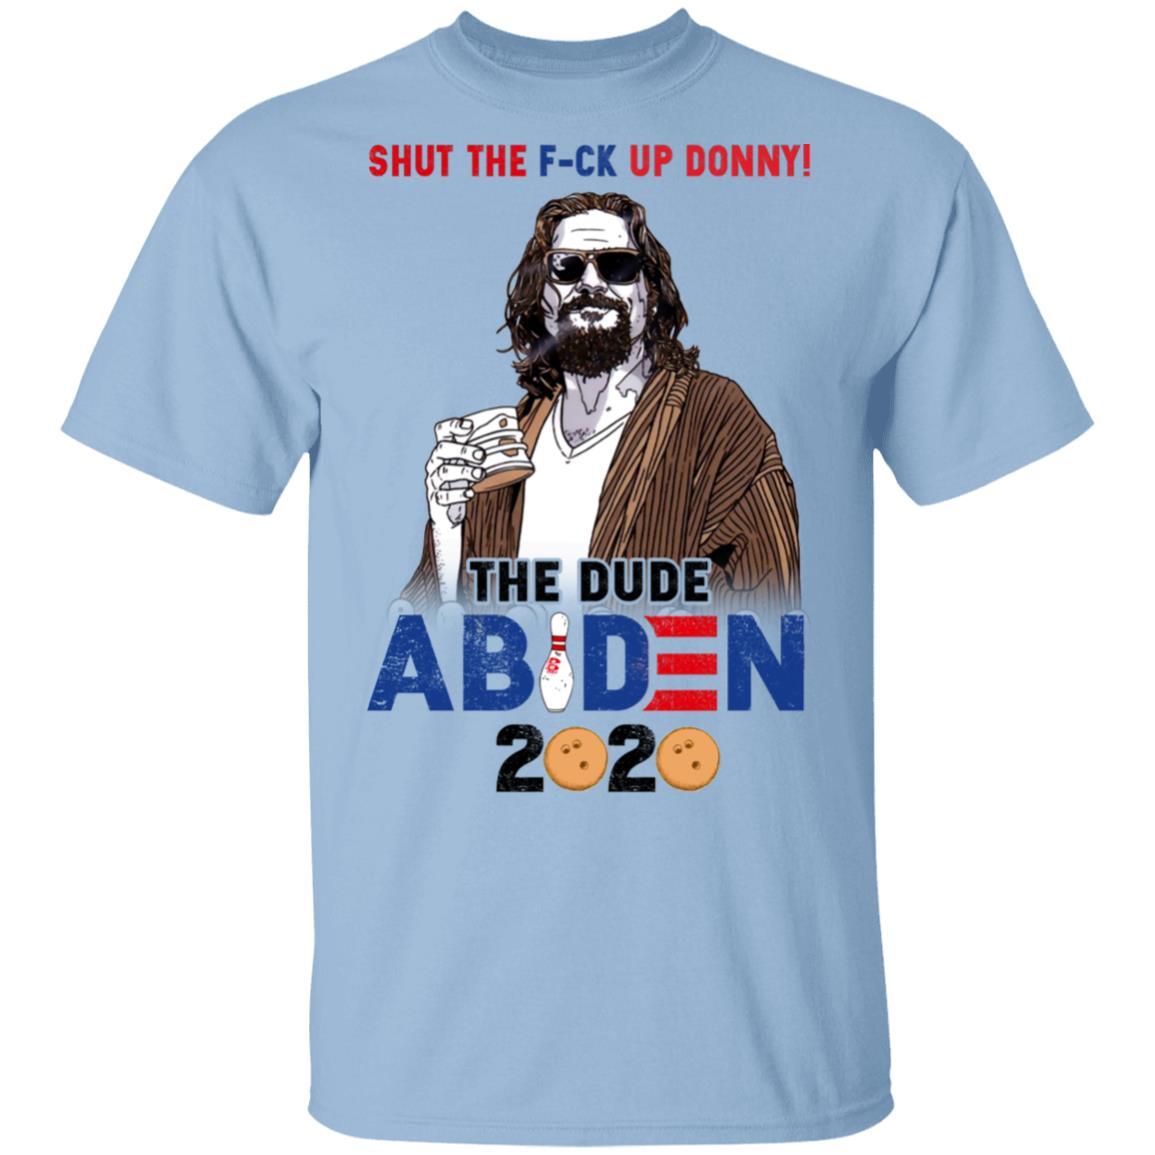 The Big Lebowski Shut the Fuck up Donny Funny Bowling T-Shirt